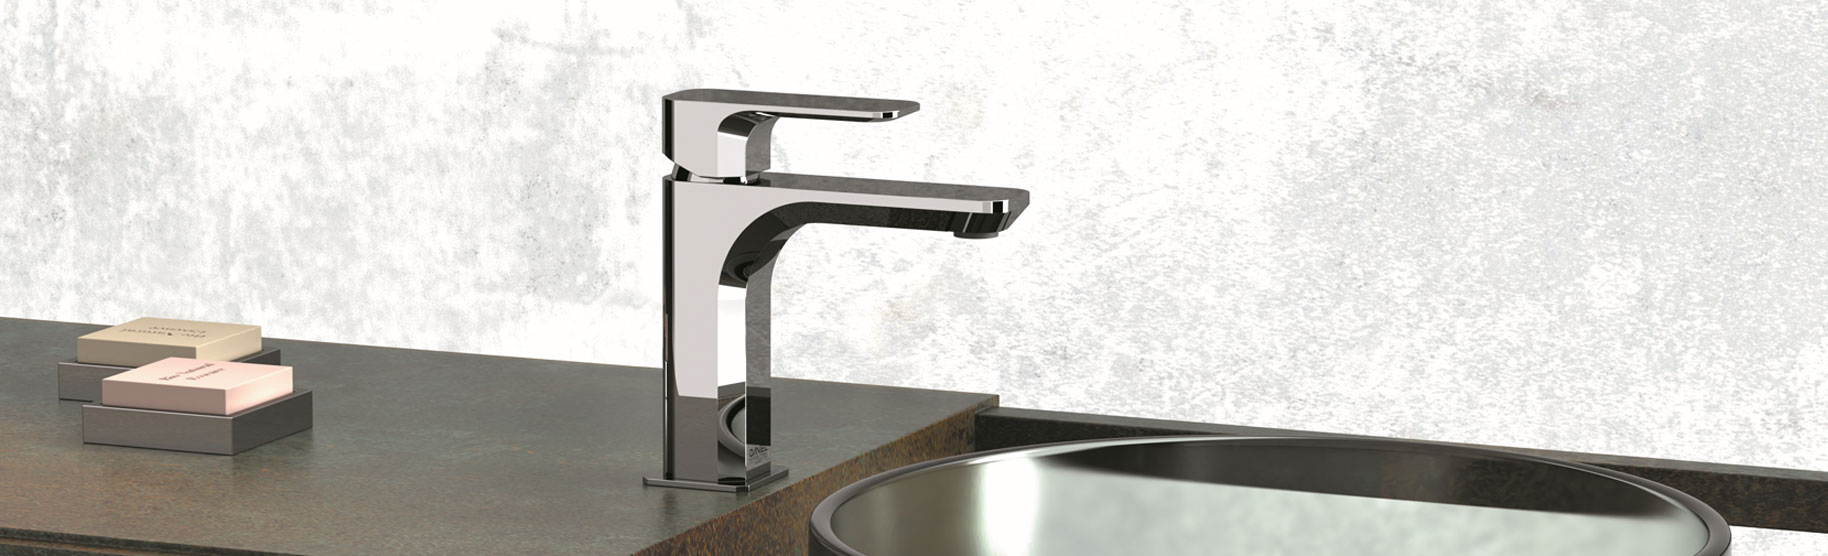 TIARA single-lever faucet collection